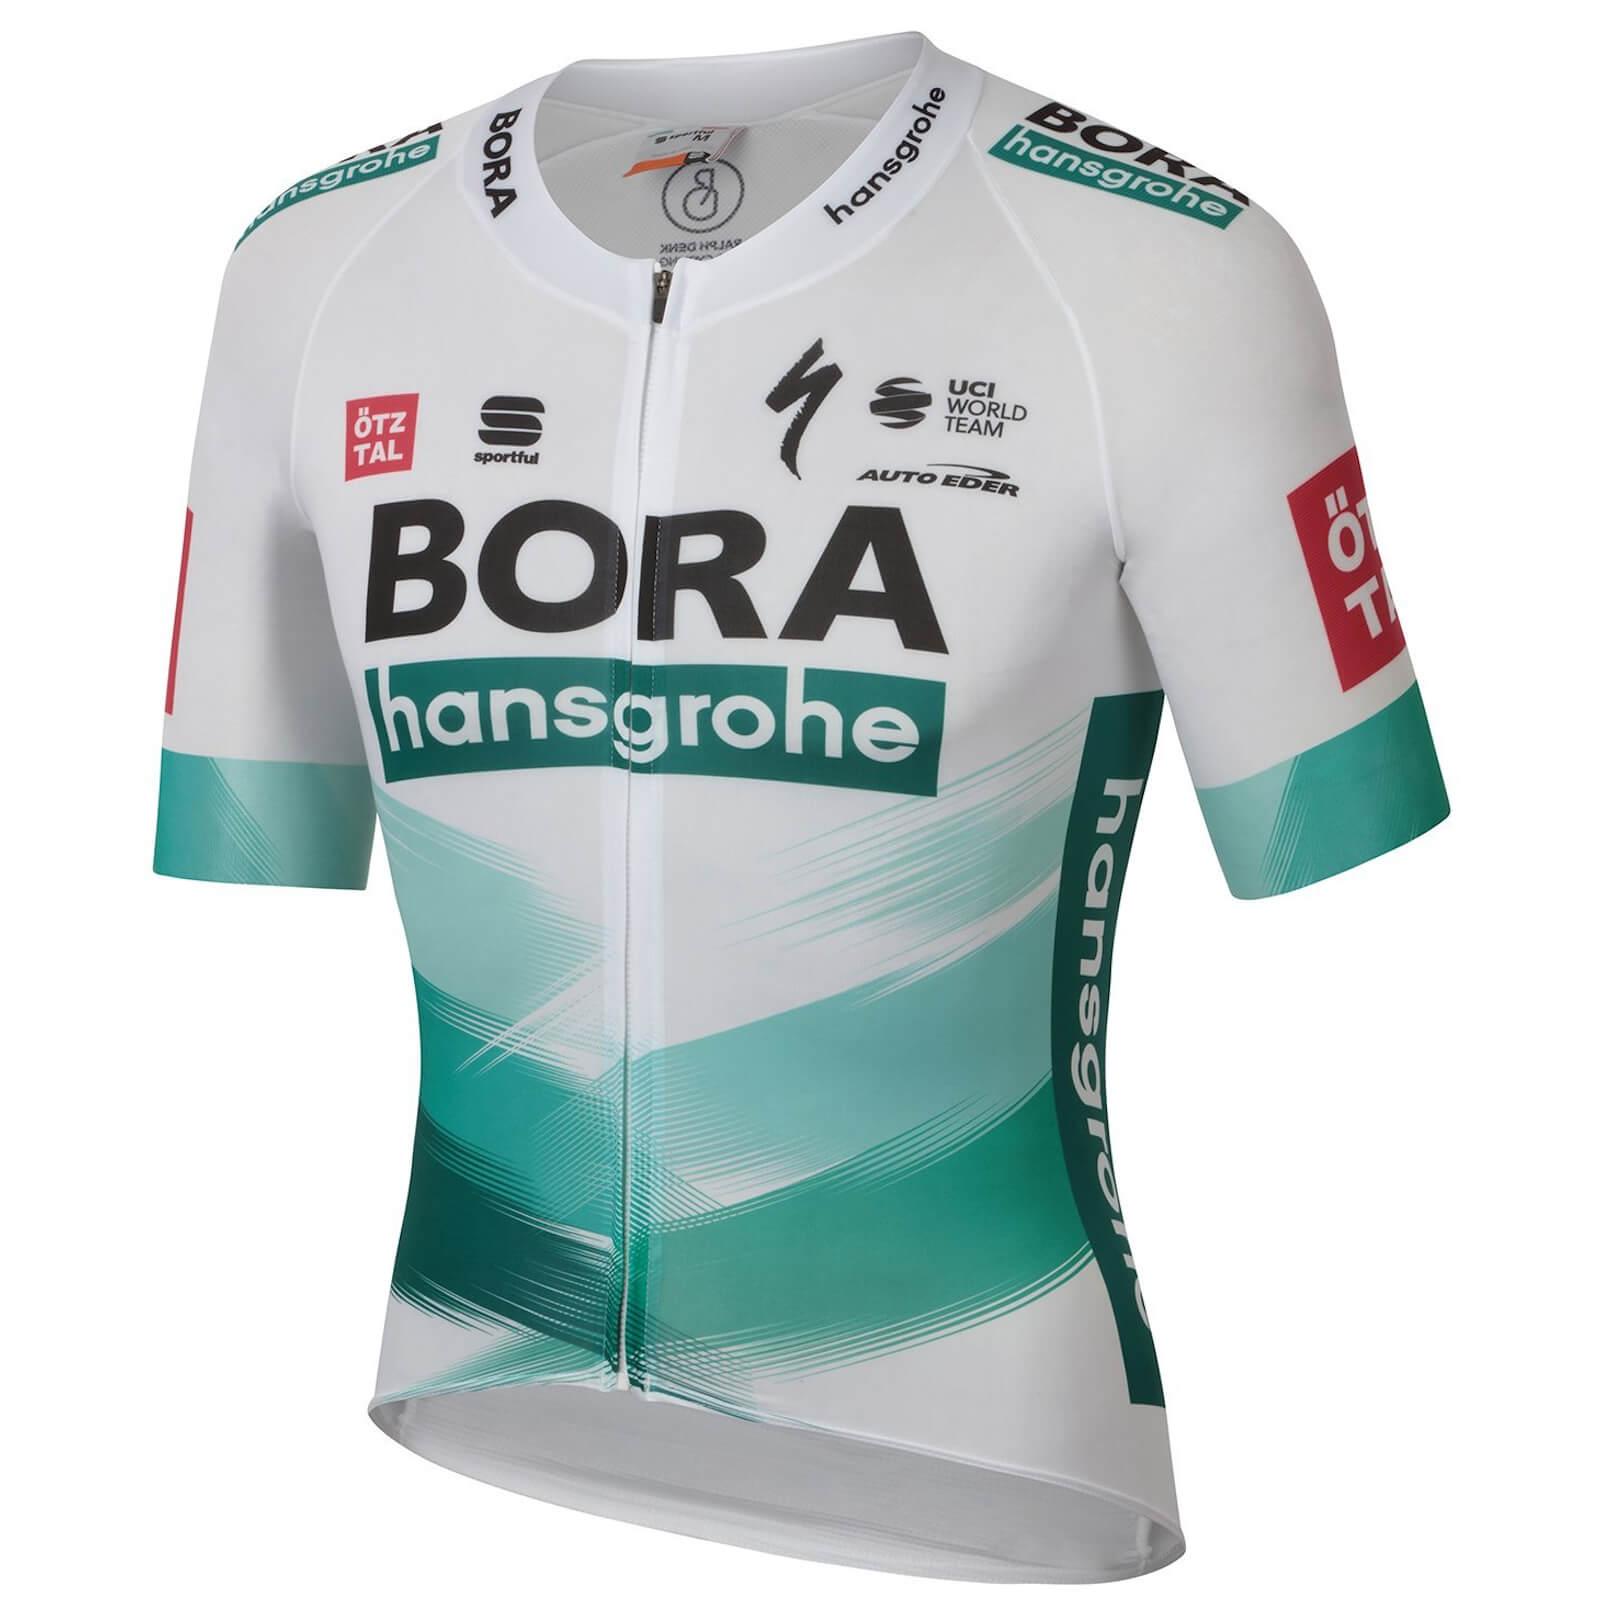 Sportful Bora Hansgrohe Tour de France Limited Edition Bomber Team Jersey - M